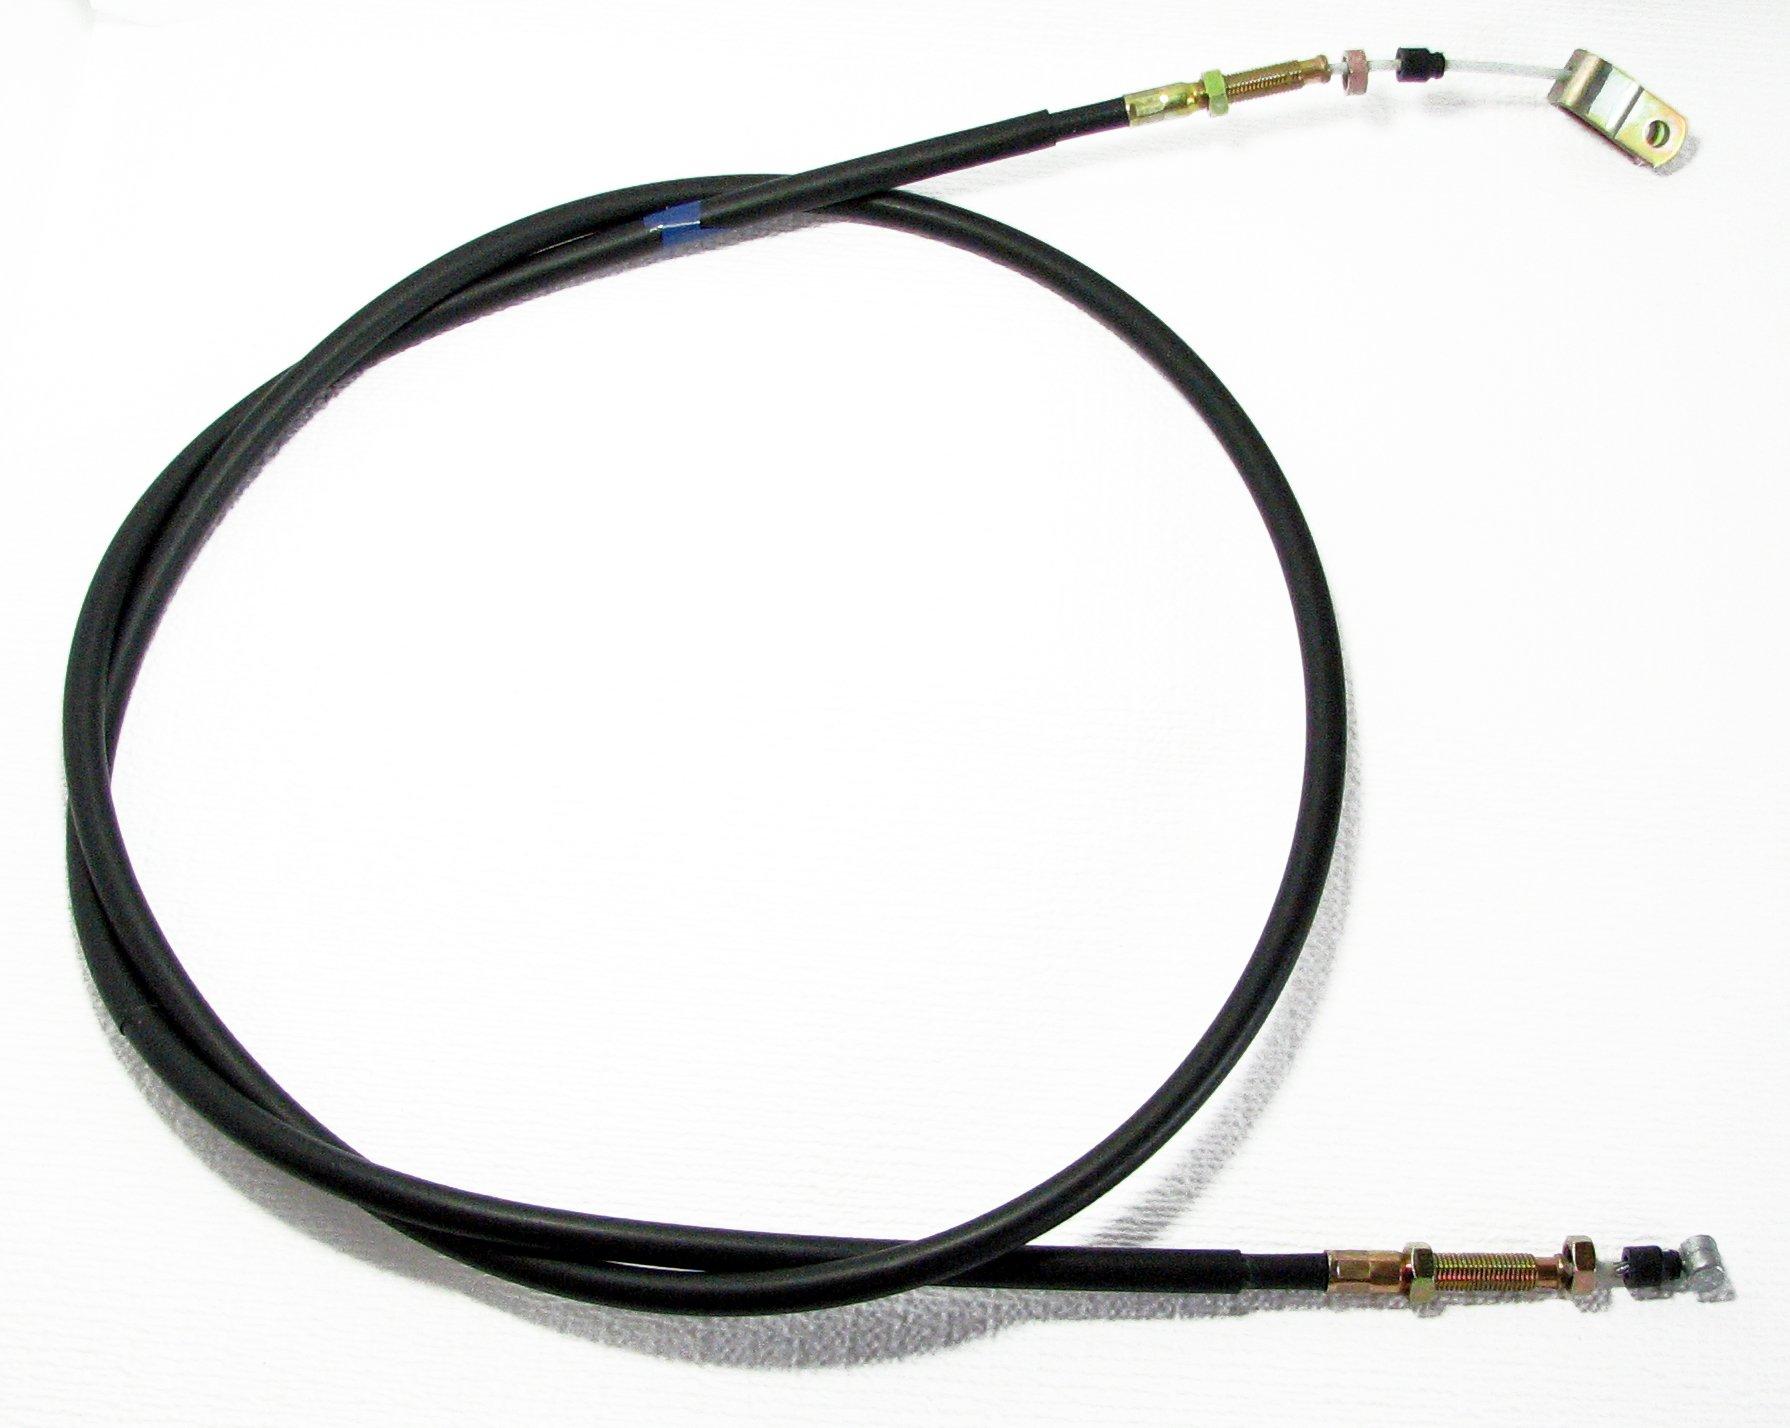 KAWASAKI MULE 3010 / 4010 Trans 4x4 Diesel / Gas - Right Parking Brake Cable - Replaces OEM # 54005-7504 & 54005-7502